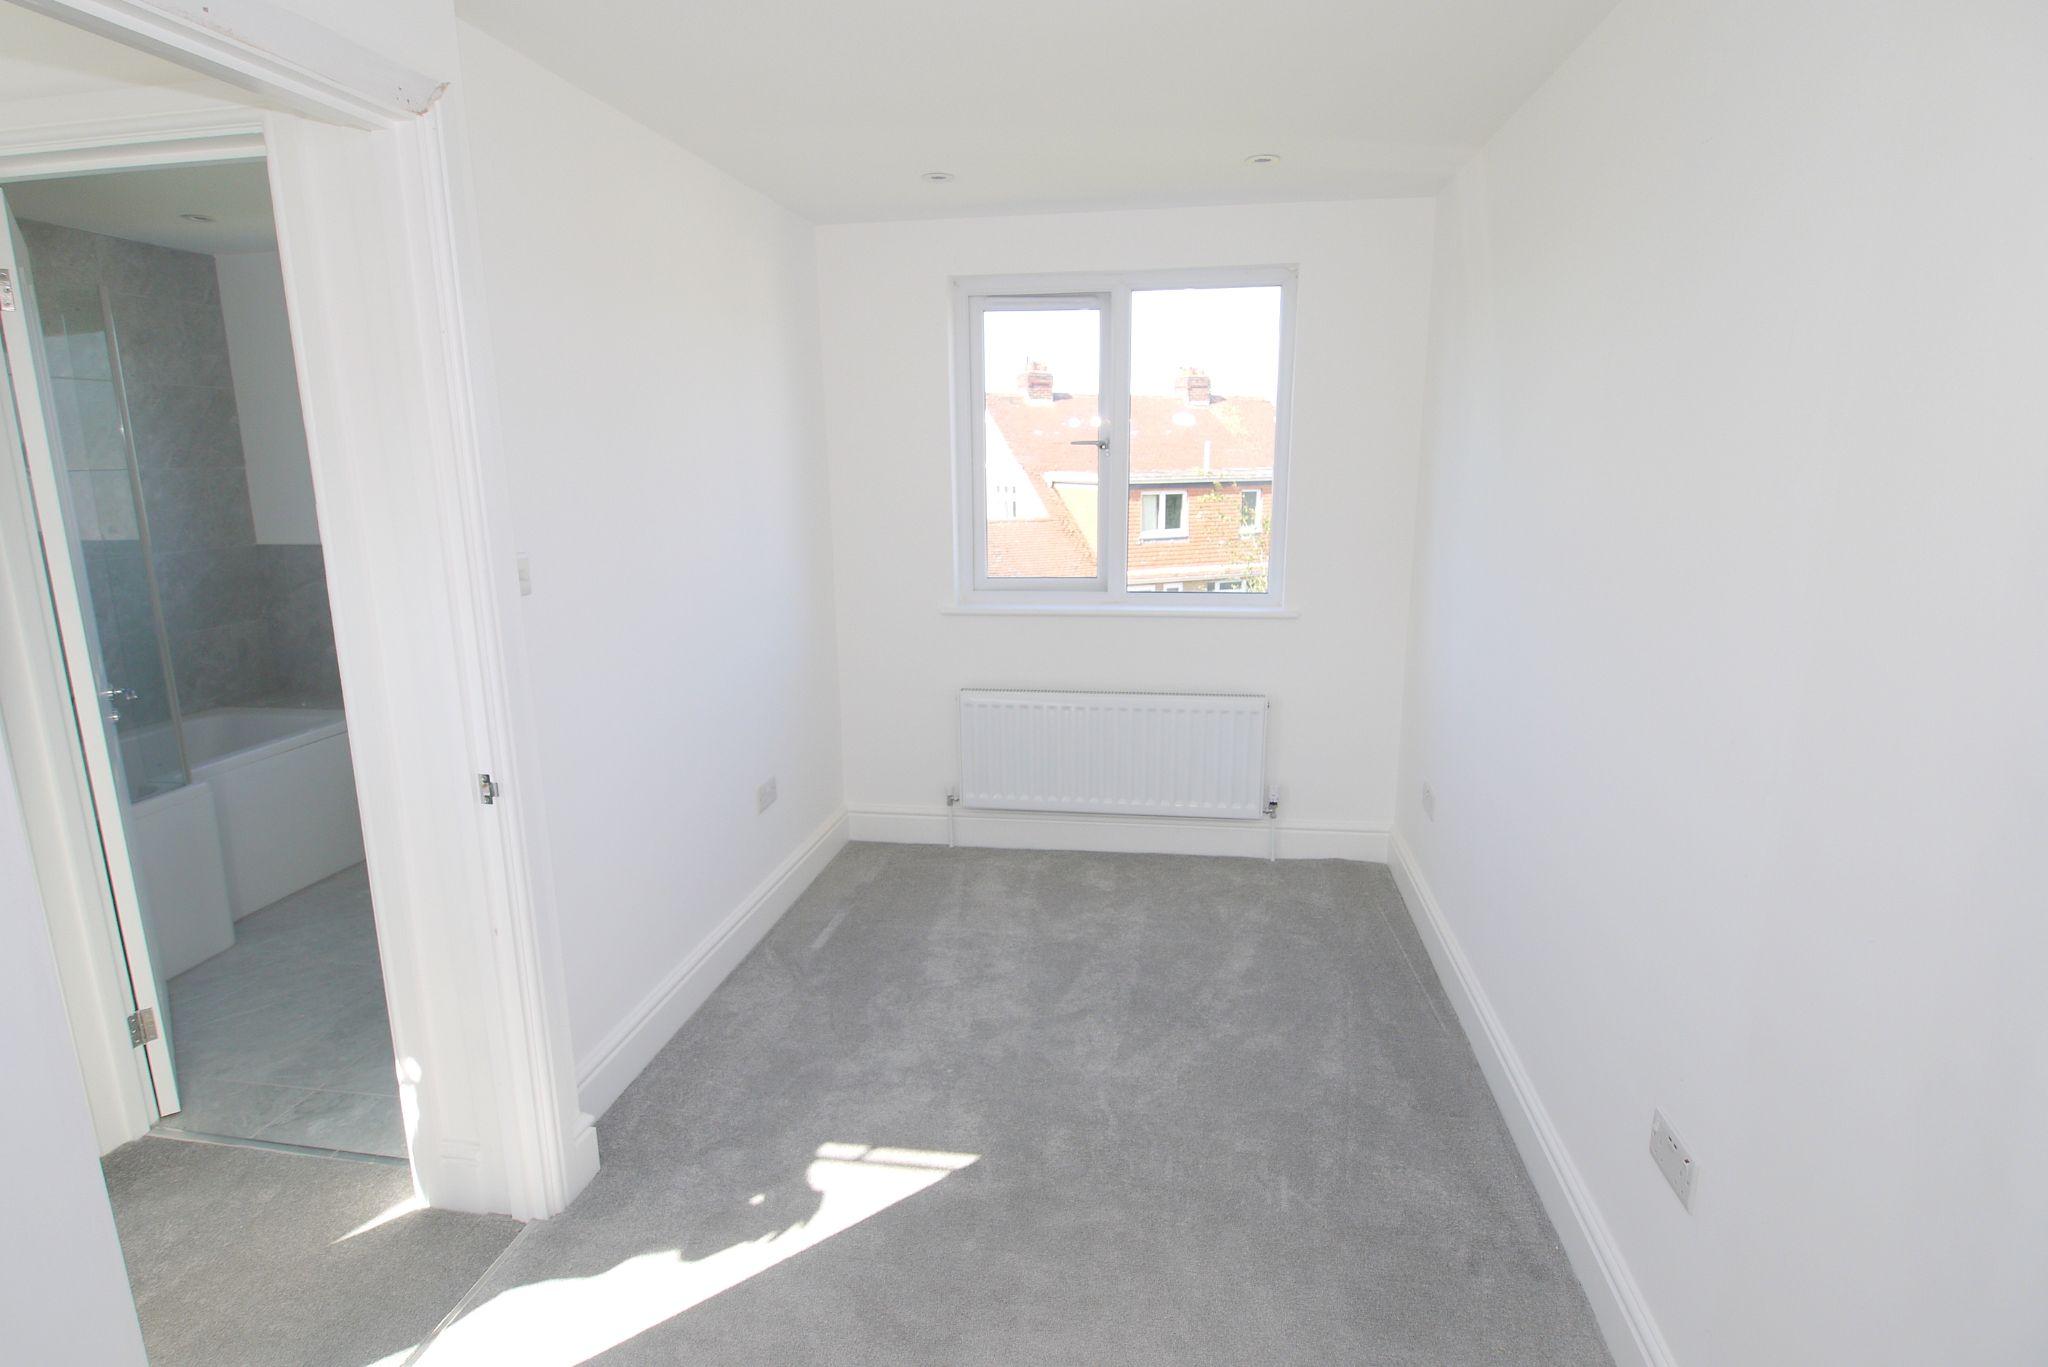 3 bedroom chalet house For Sale in Sevenoaks - Photograph 6